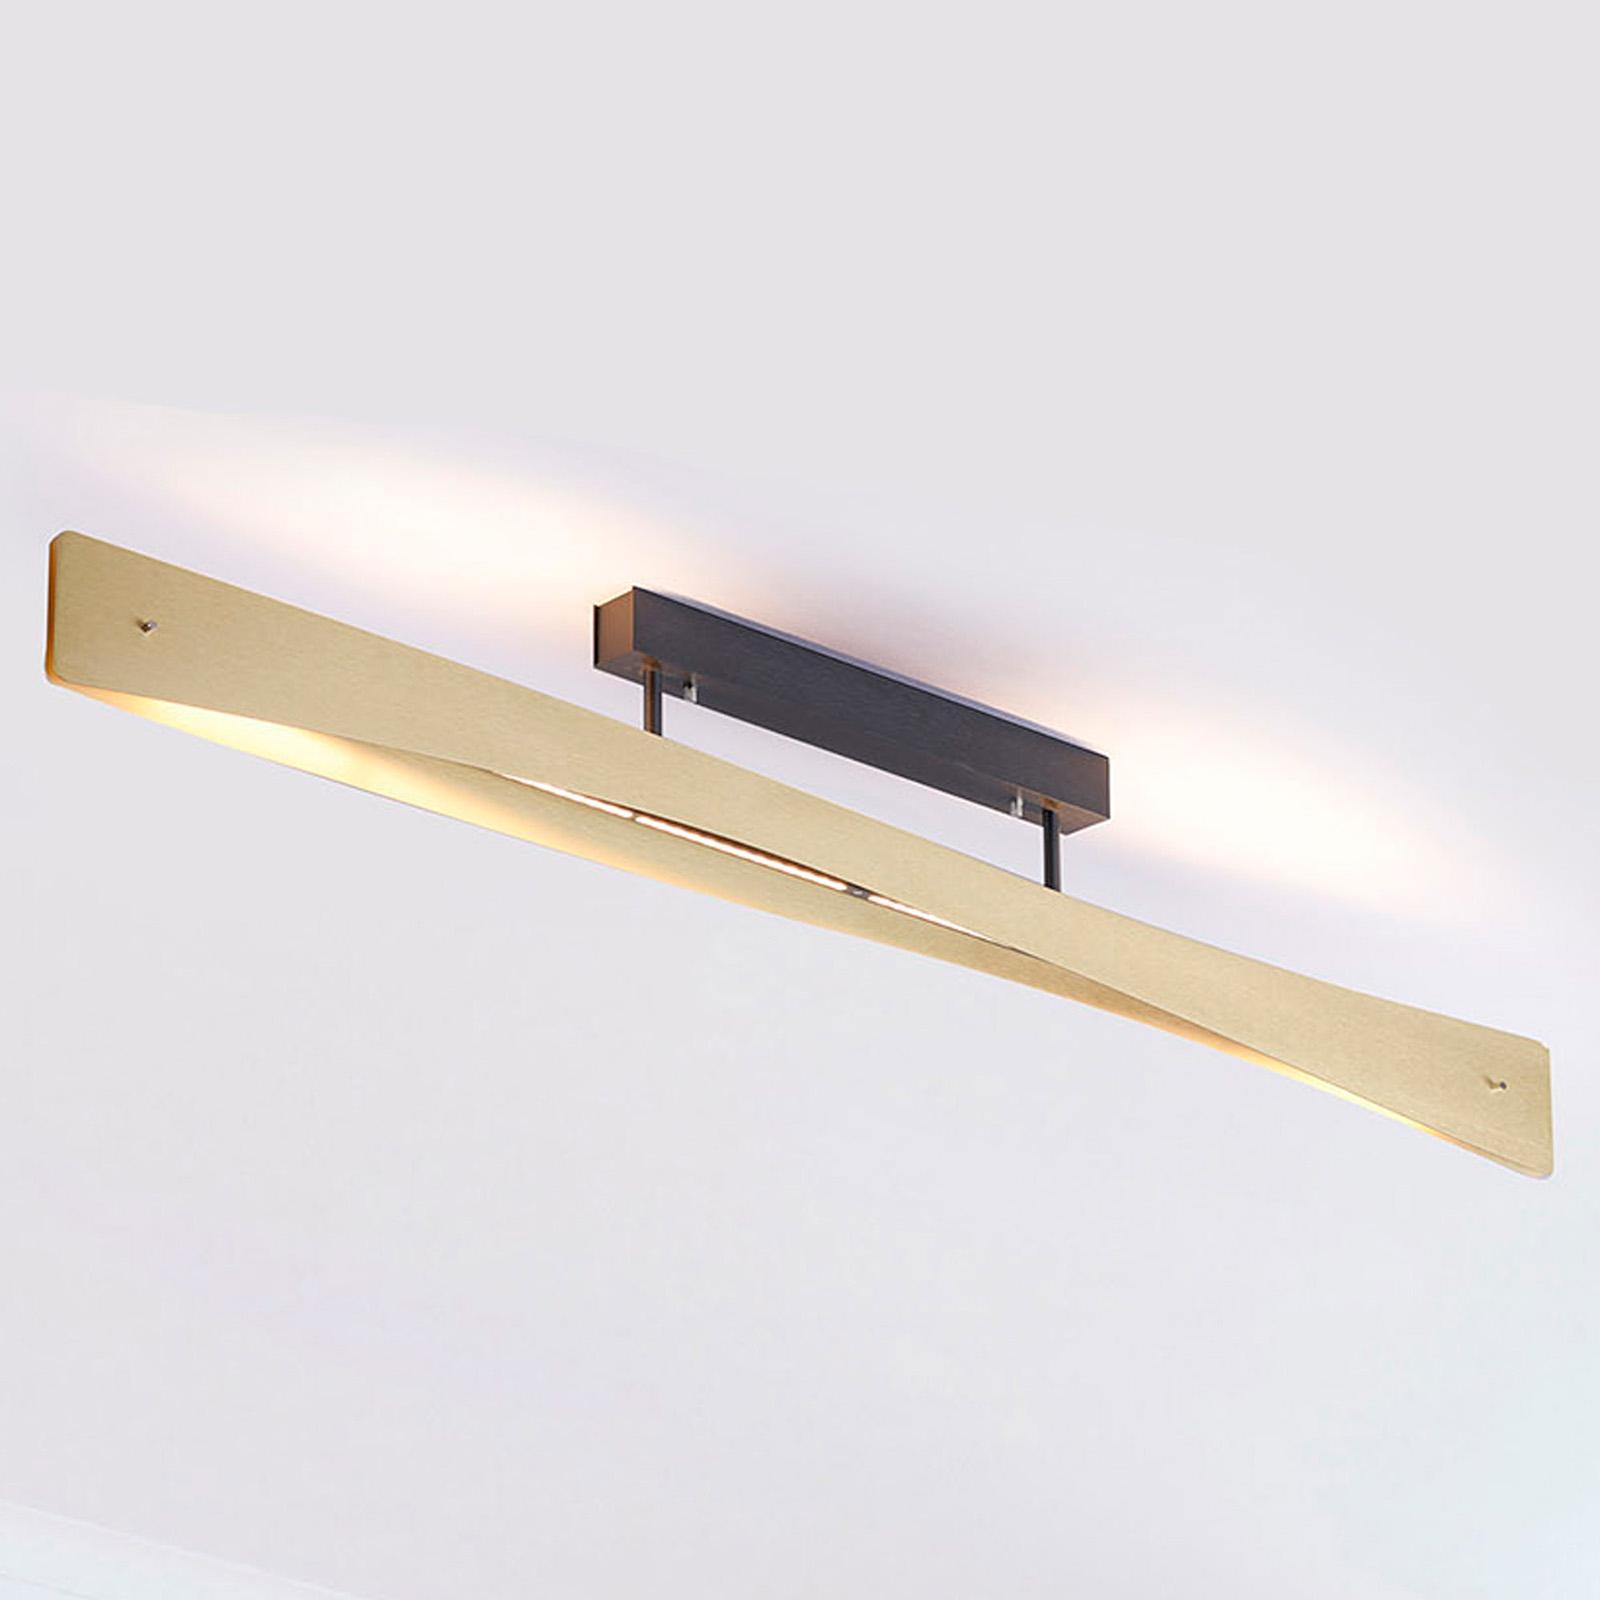 Lucande Lian LED plafondlamp, messing, zwart